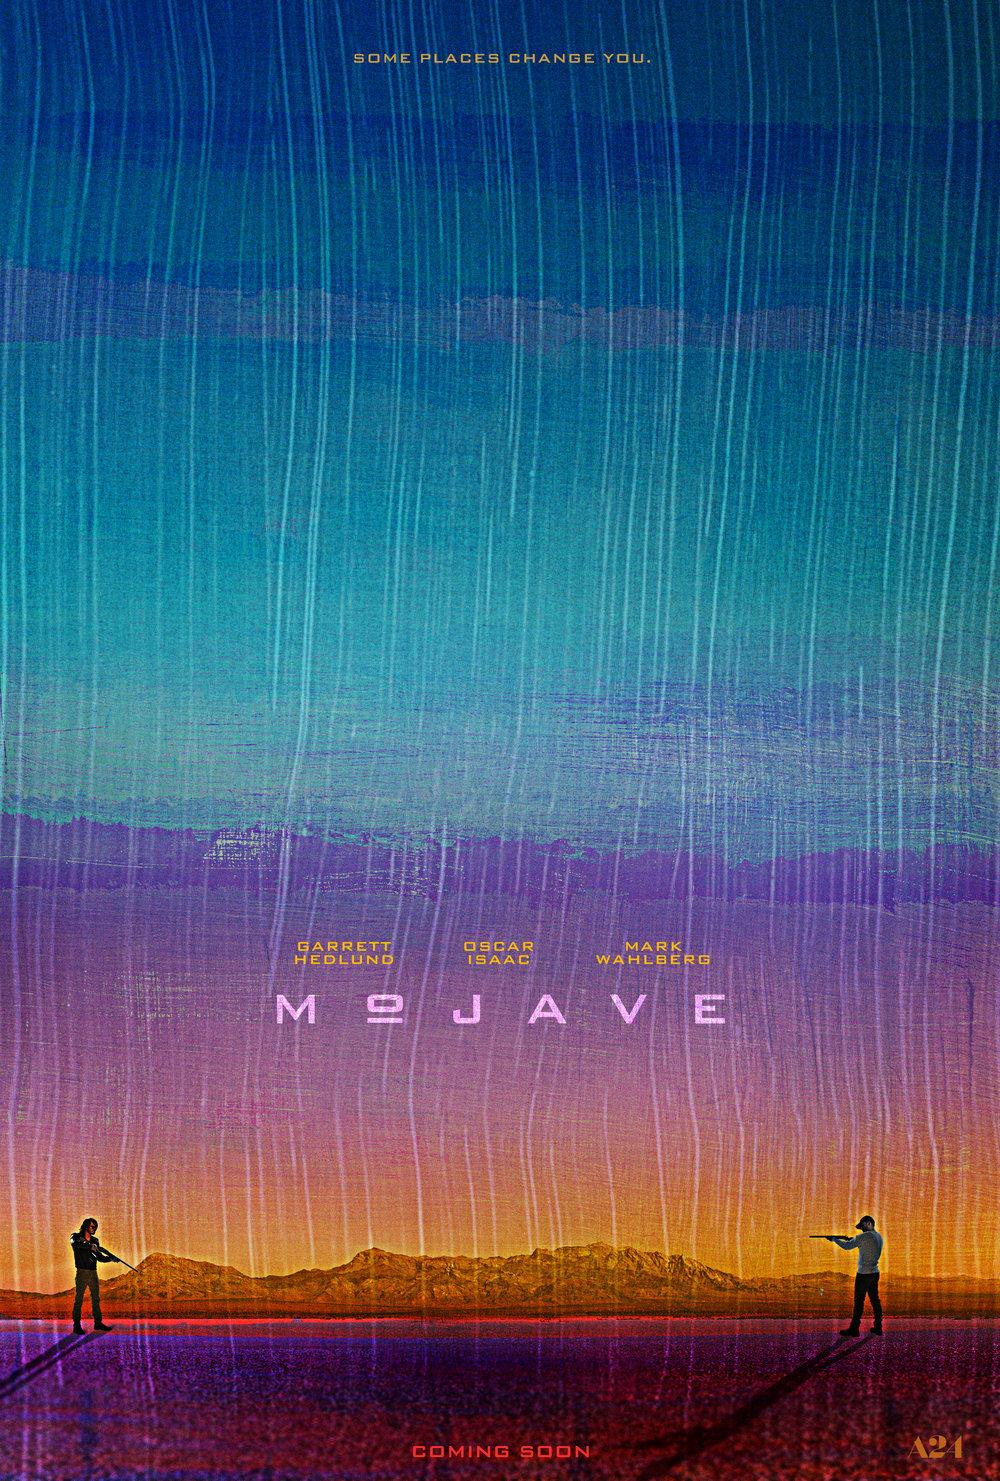 Mojave - A24